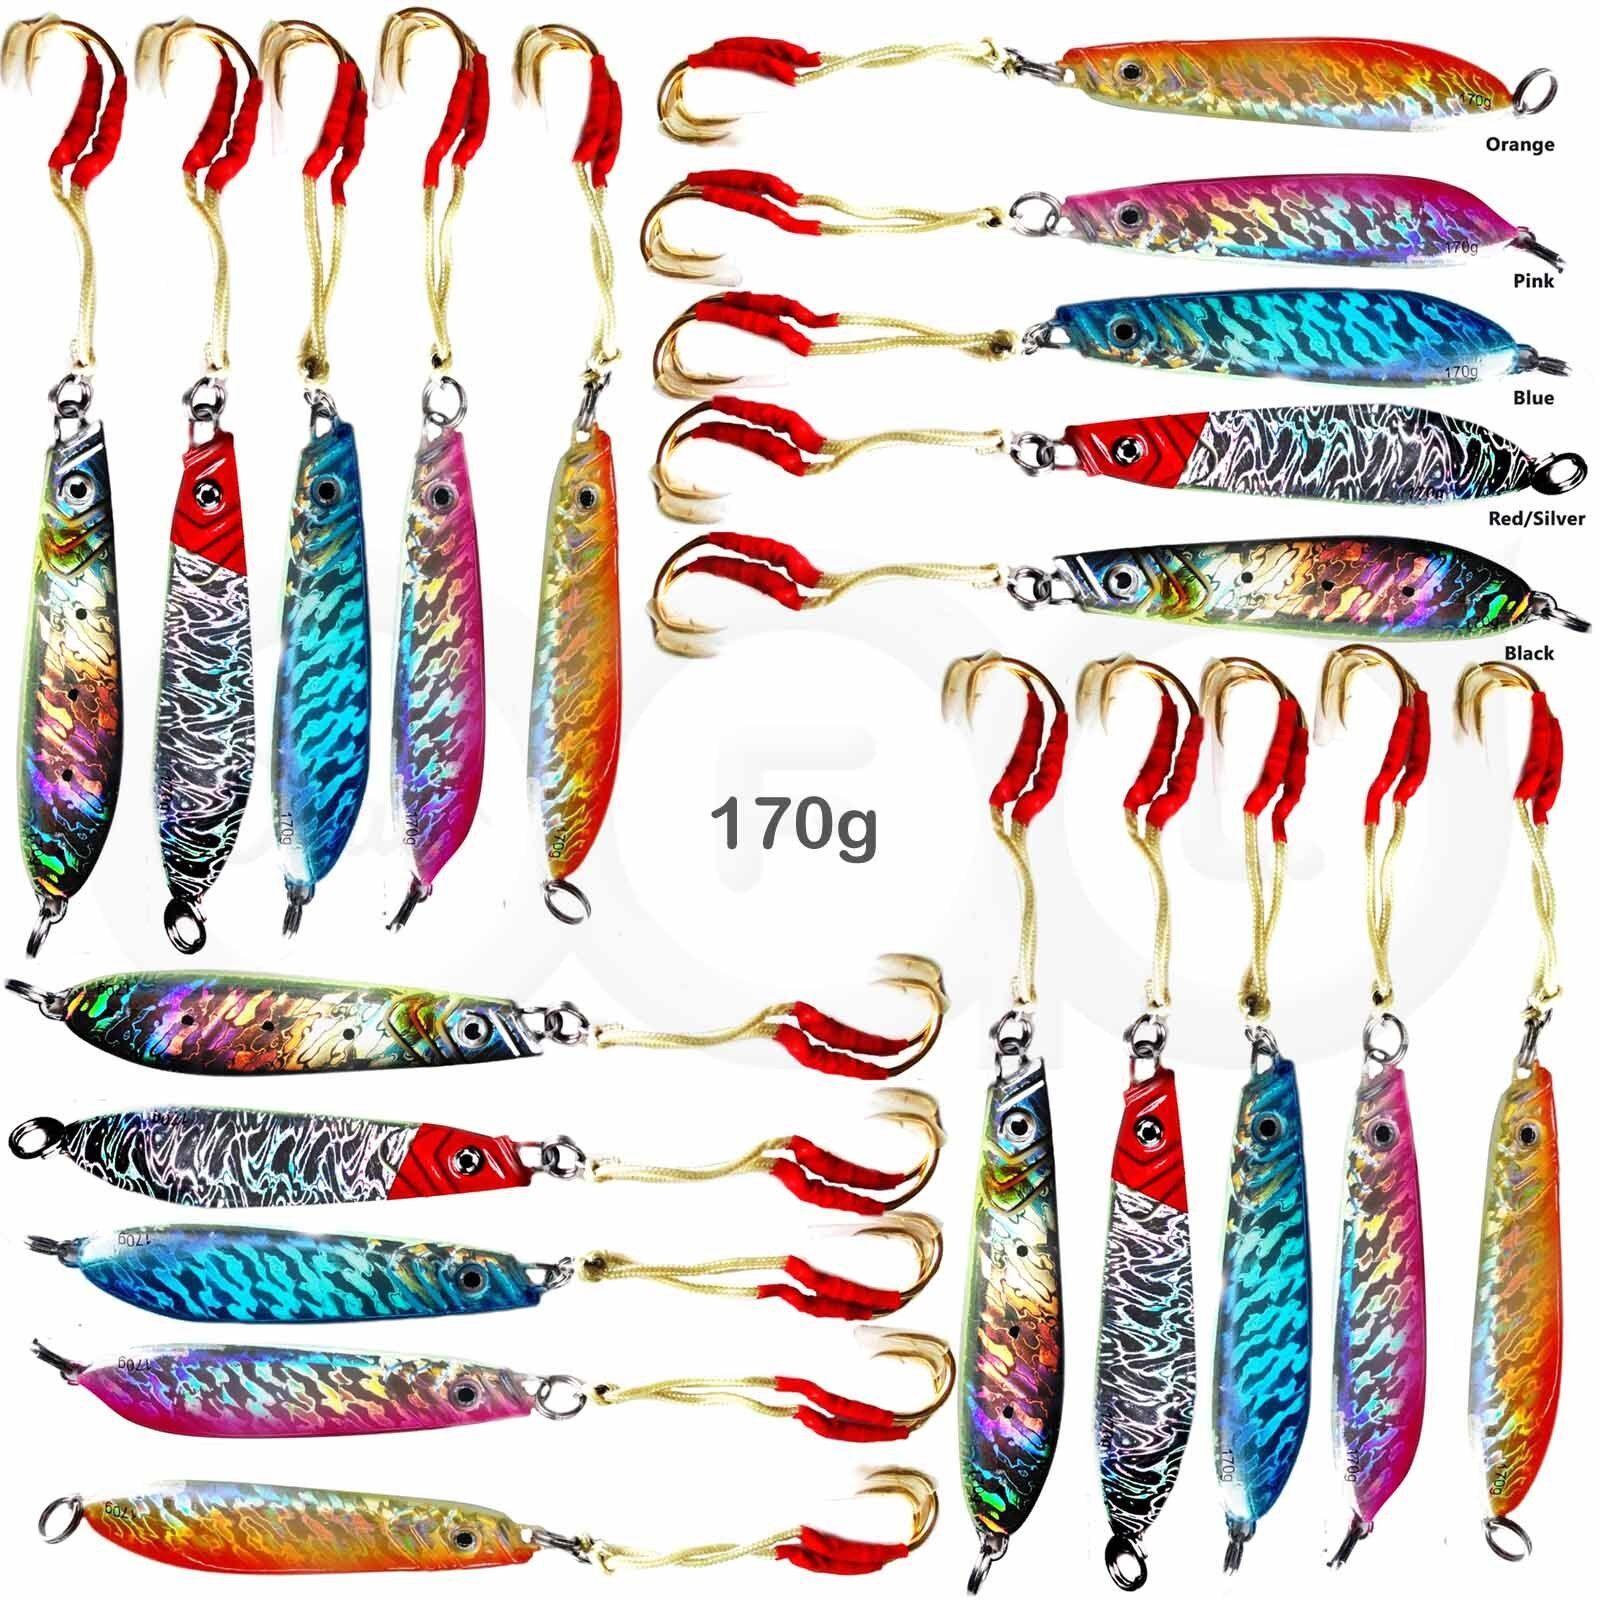 20pcs 170g Fishing greenical Knife Jig 6oz Fish Lure Speed jig assist hook 5color